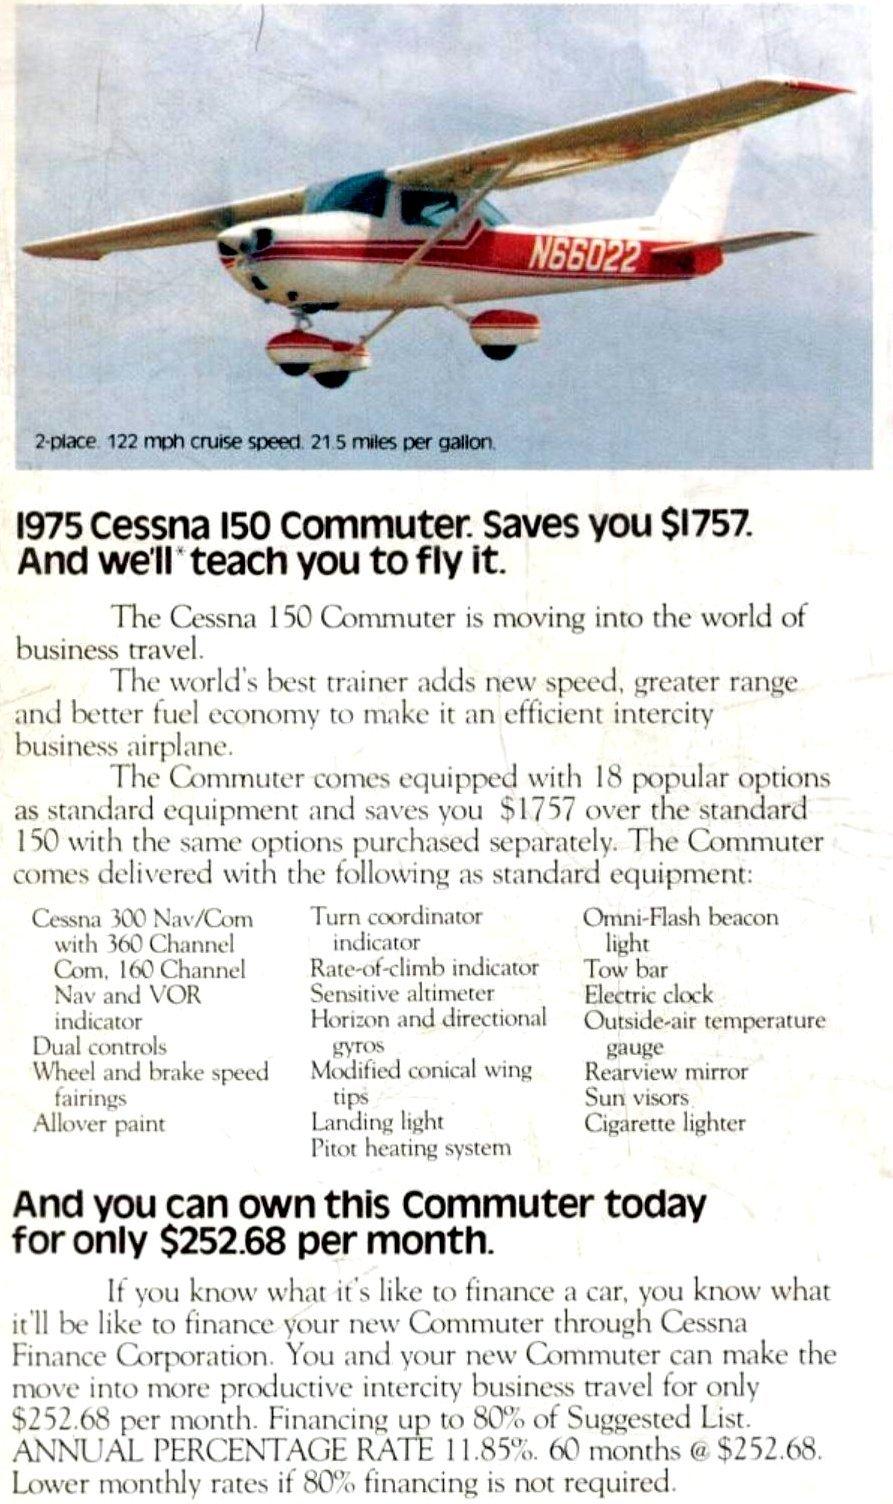 1975 Cessna 150 commuter plane